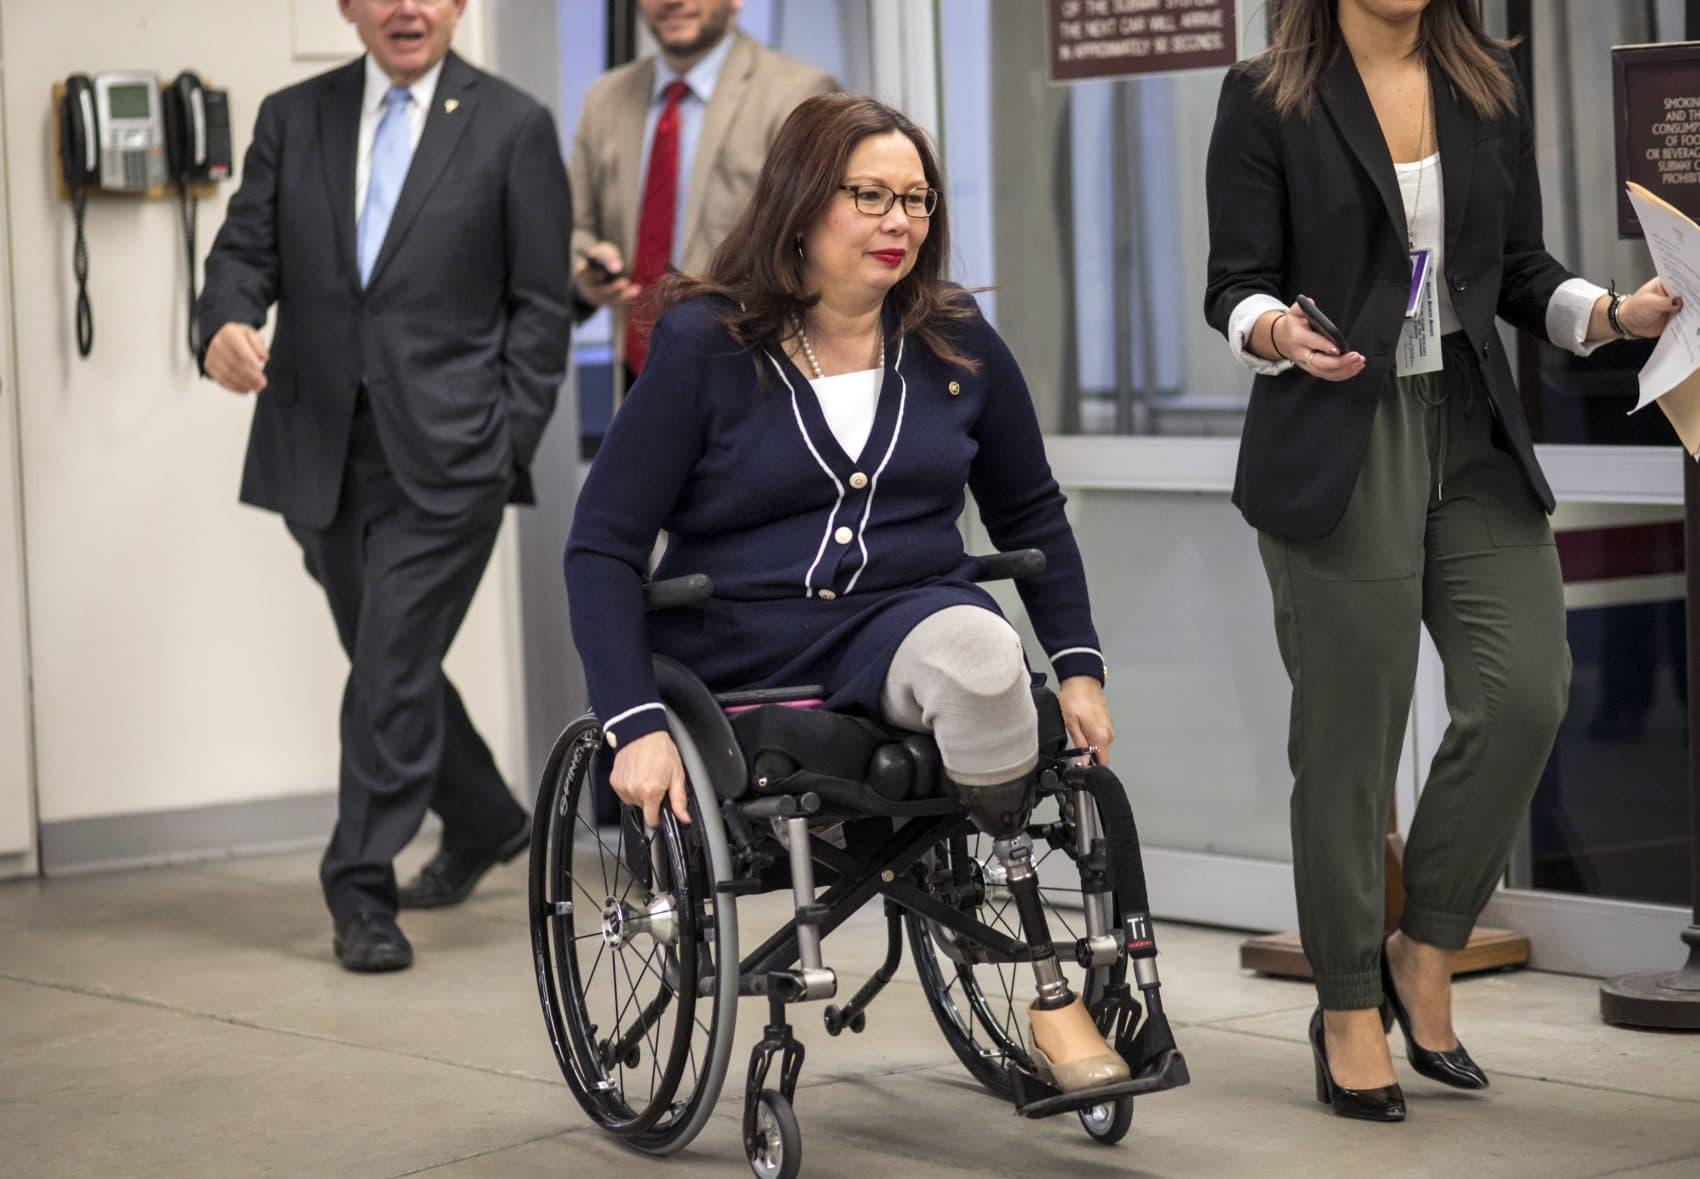 Sen. Tammy Duckworth (D-Ill.) and other senators arrive for a vote at the U.S. Capitol in Washington, D.C. Wednesday, Jan. 24, 2018. (J. Scott Applewhite/AP)